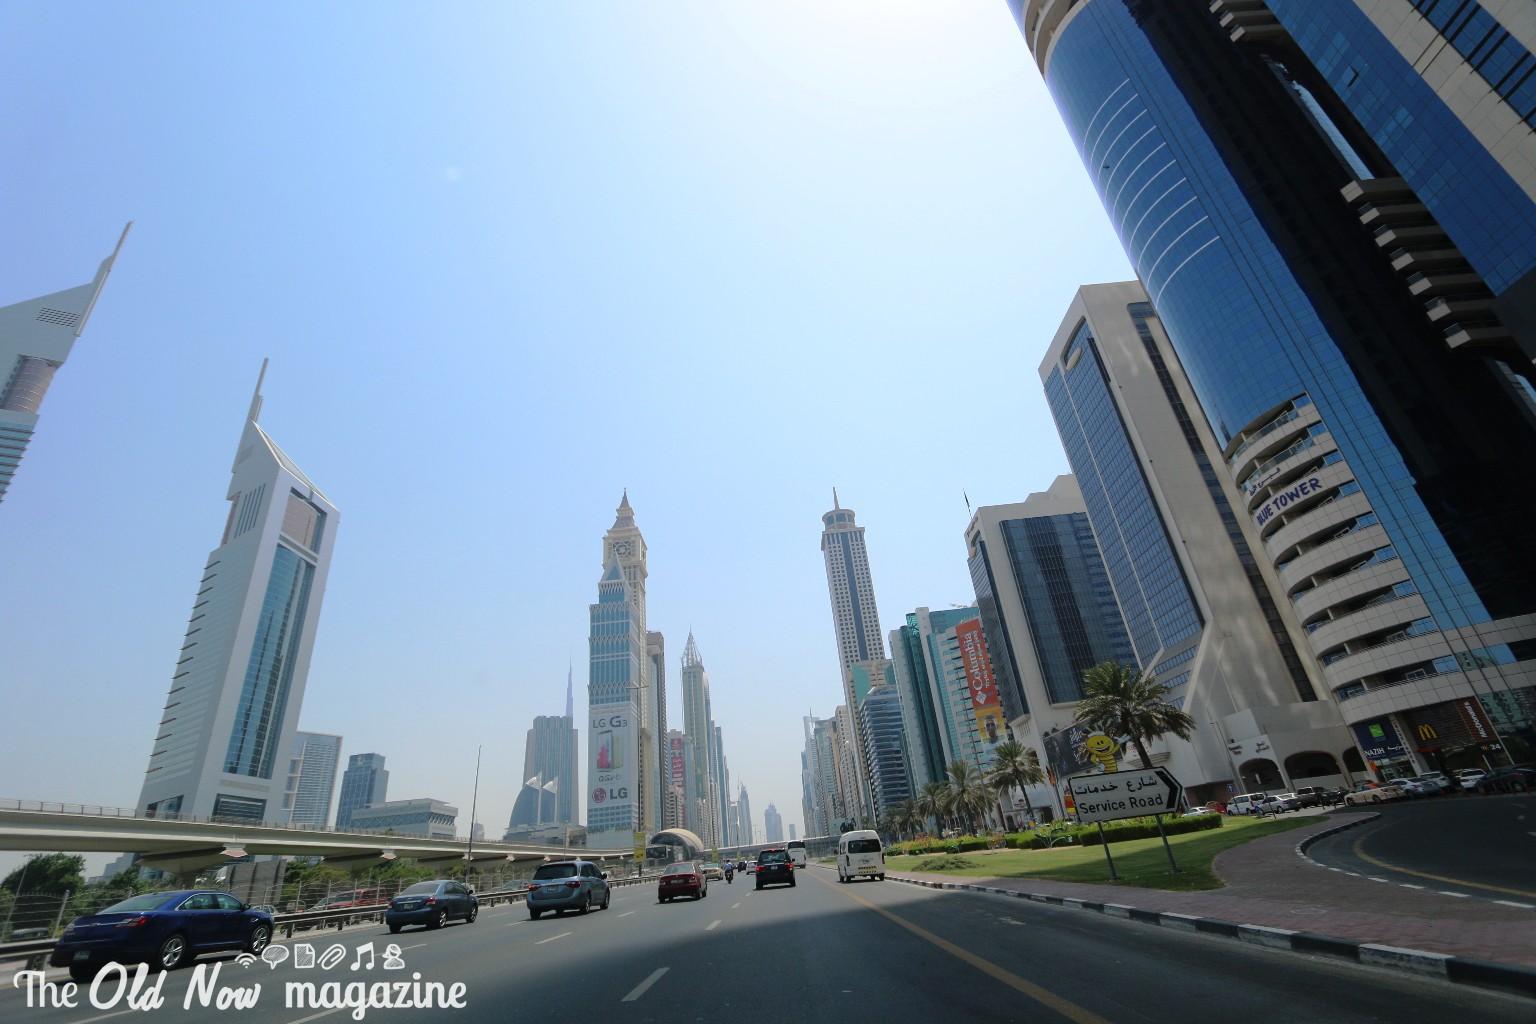 DUBAY DAY1 THEOLDNOW (8)